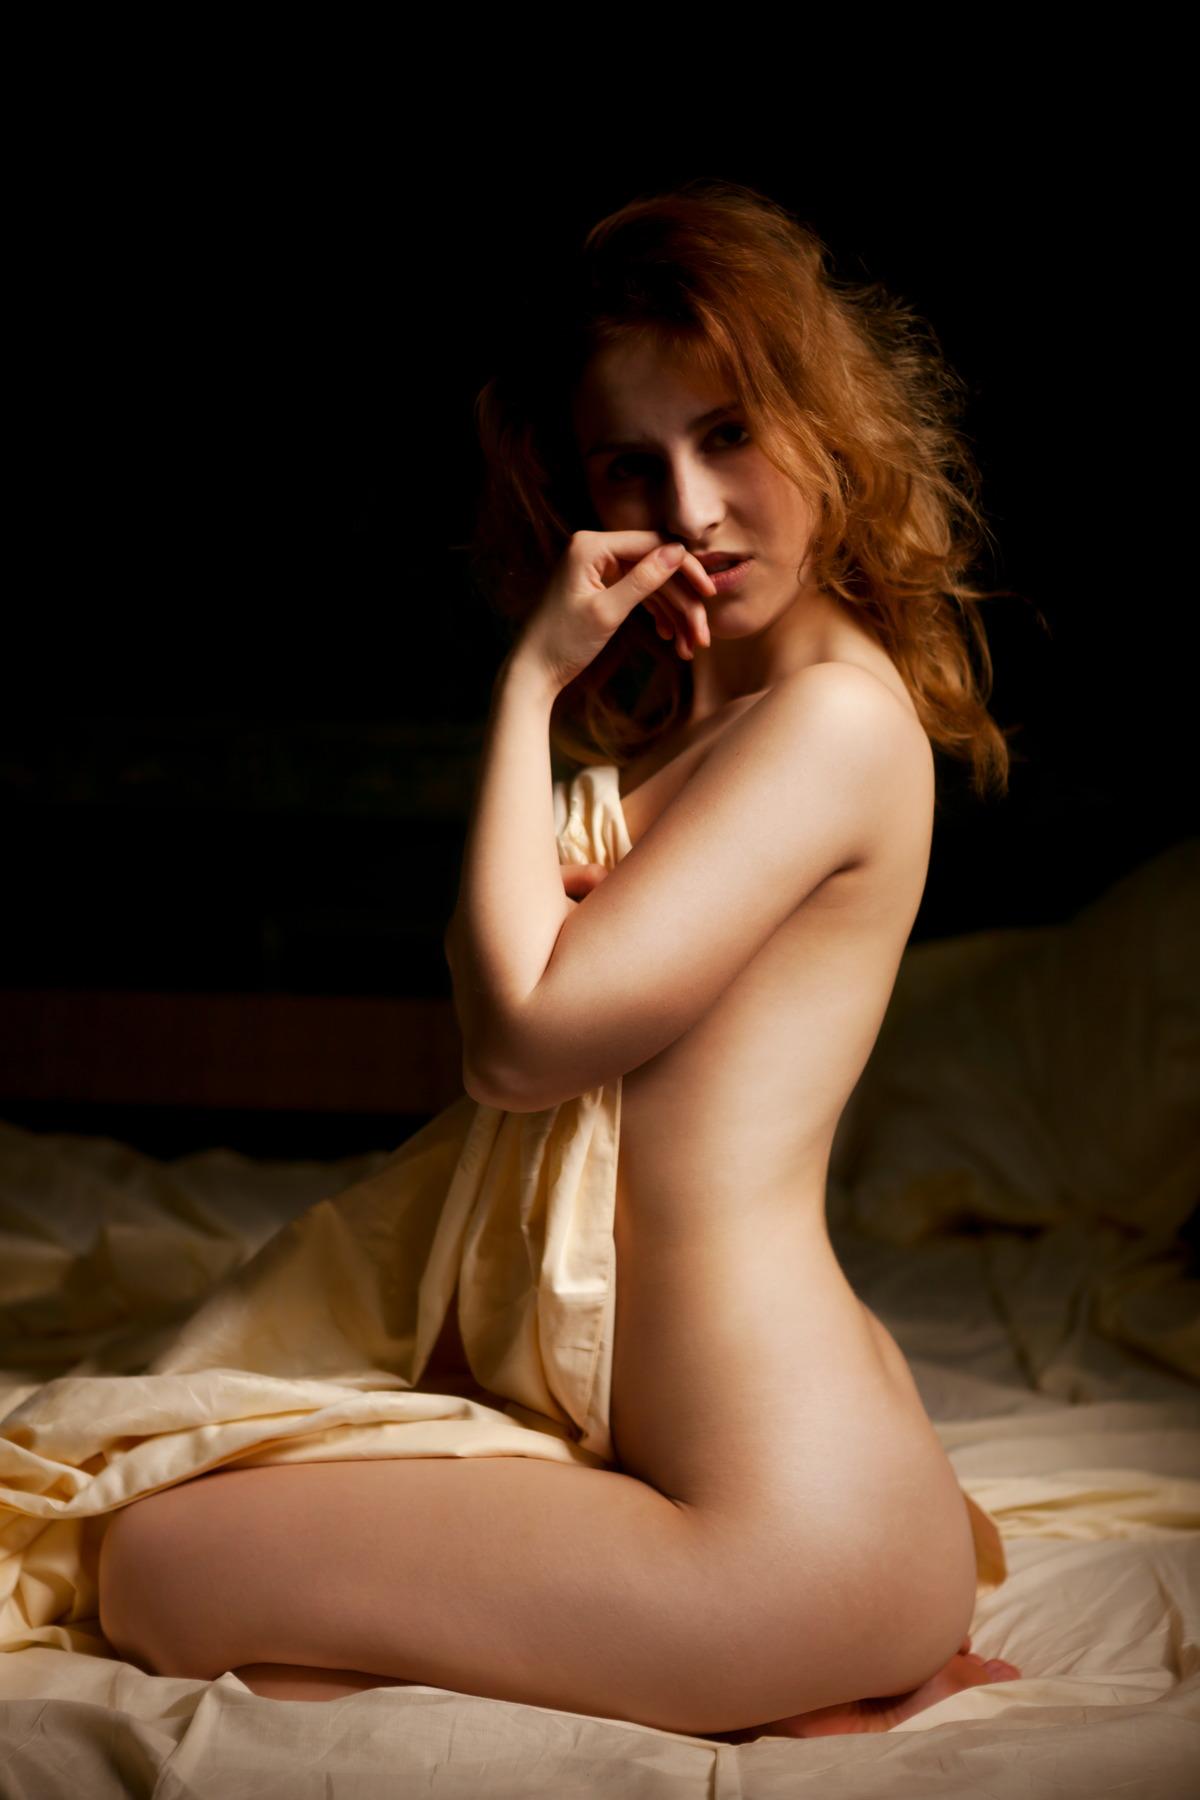 Sexy Rothaarige im Bett